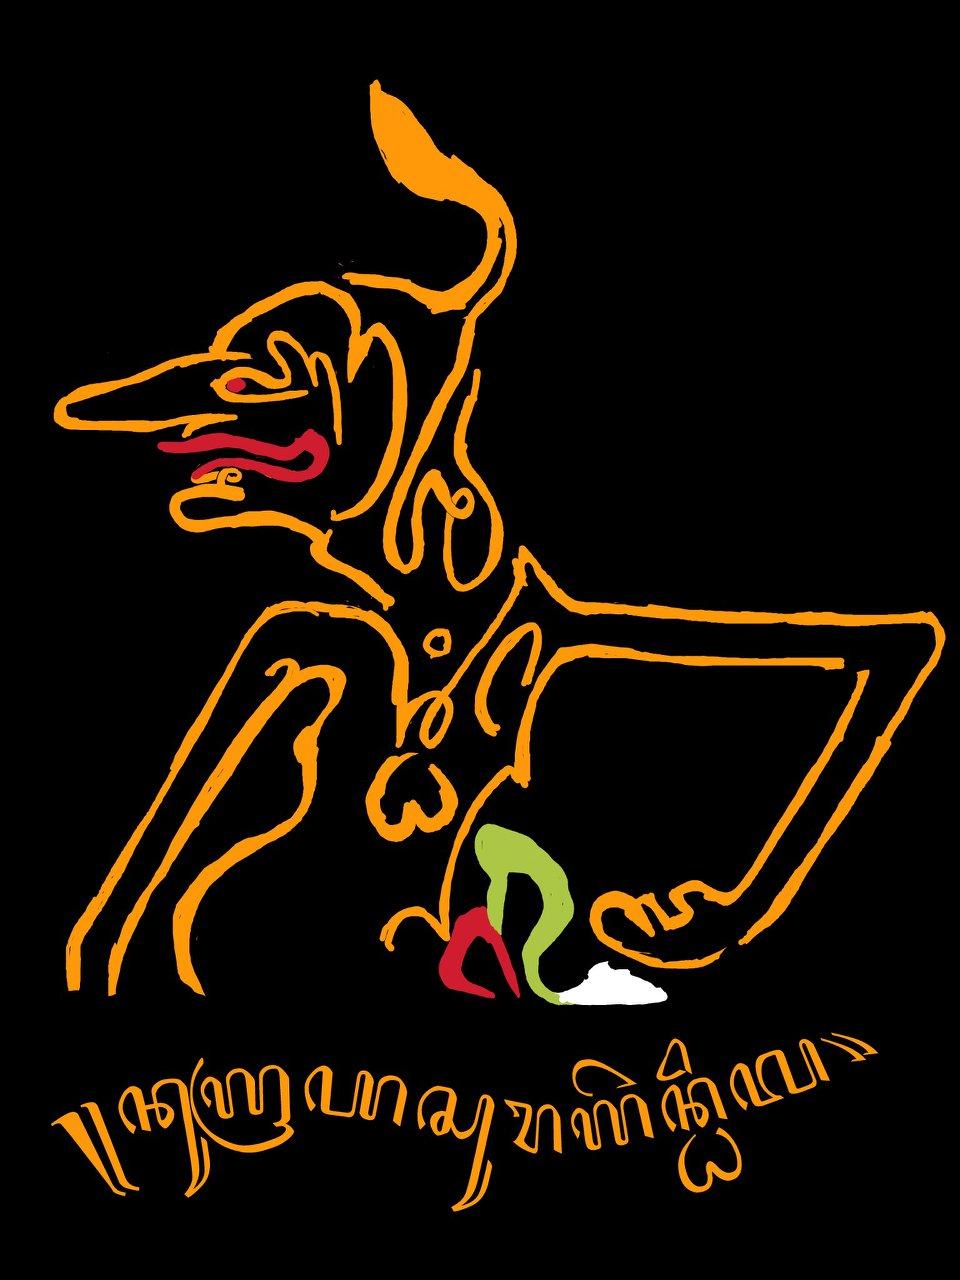 Gambar Kaligrafi Wayang